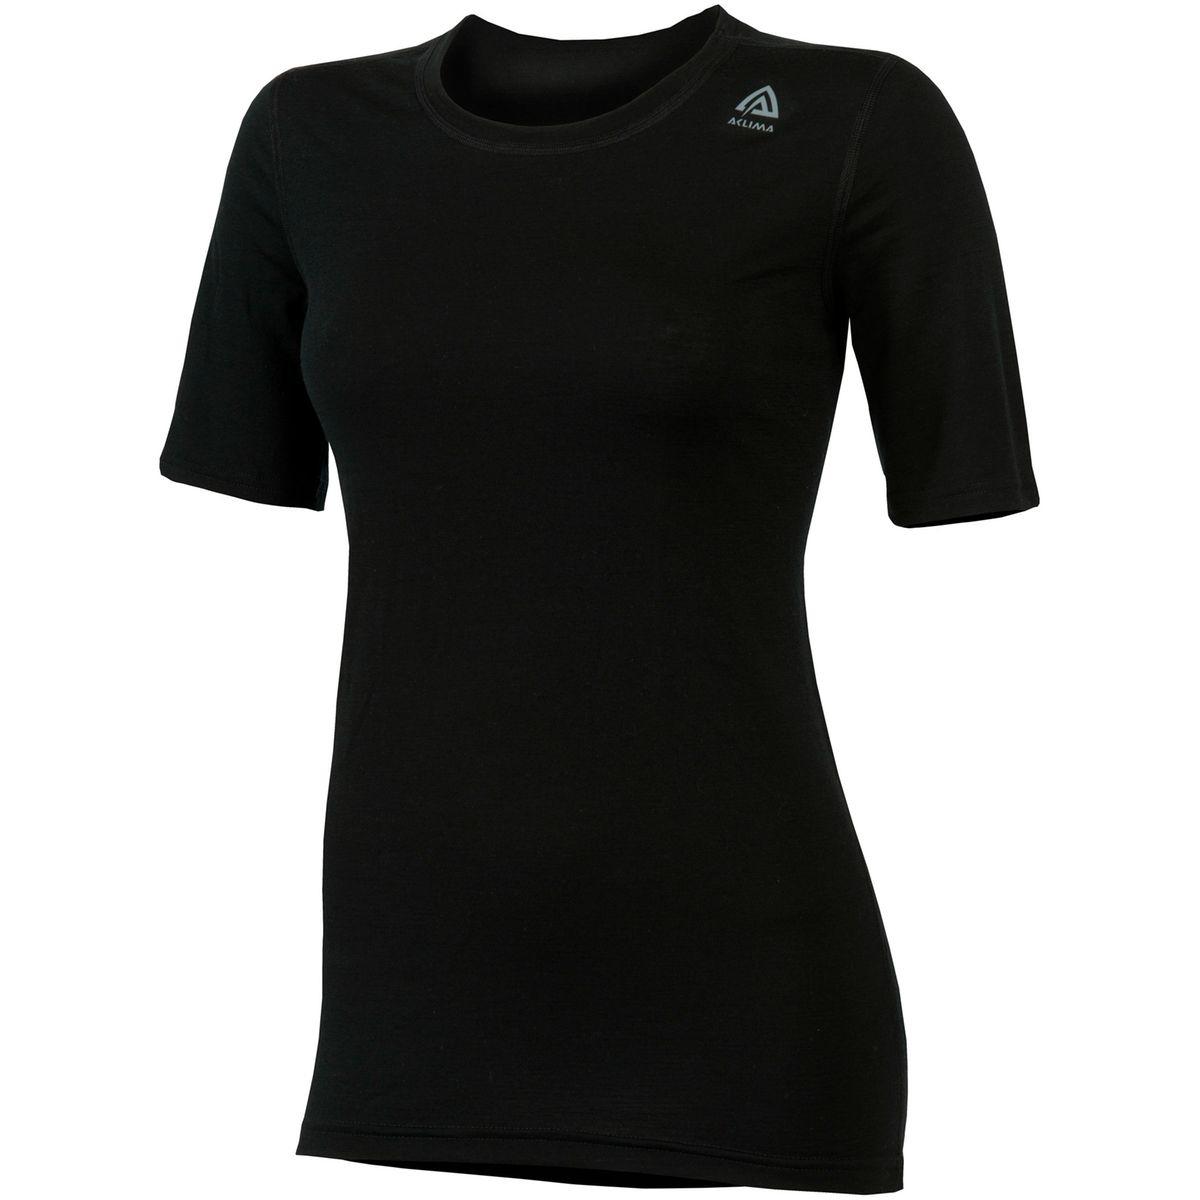 LightWool - Sous-vêtement Femme - noir